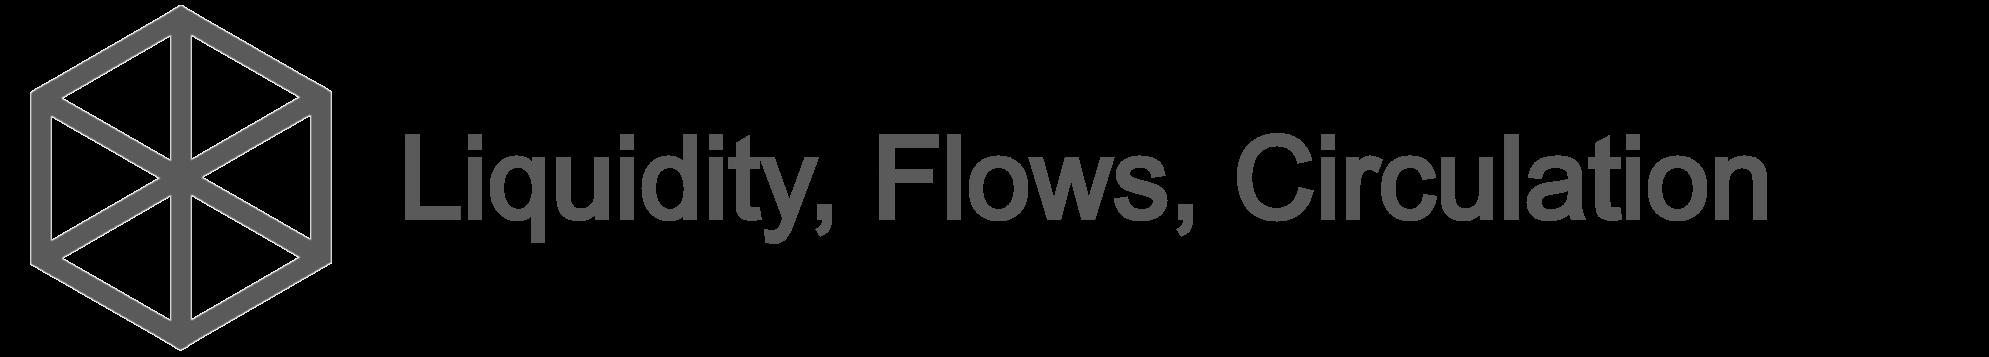 Liquidity, Flows, Circulation